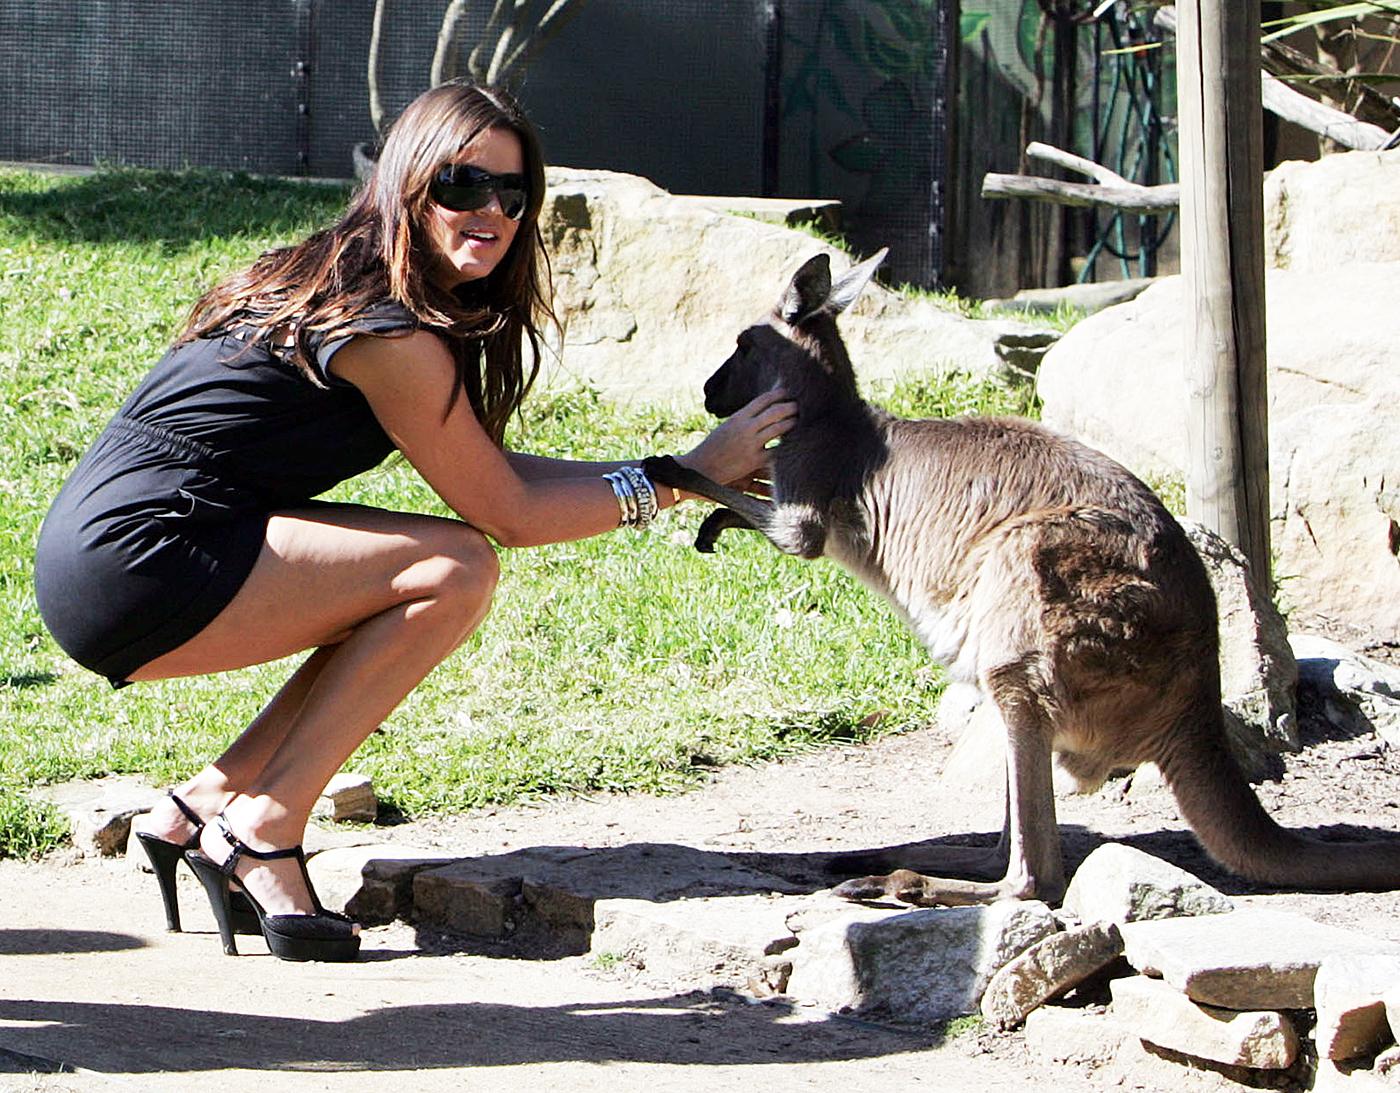 Khloe Kardashian and a kangaroo.